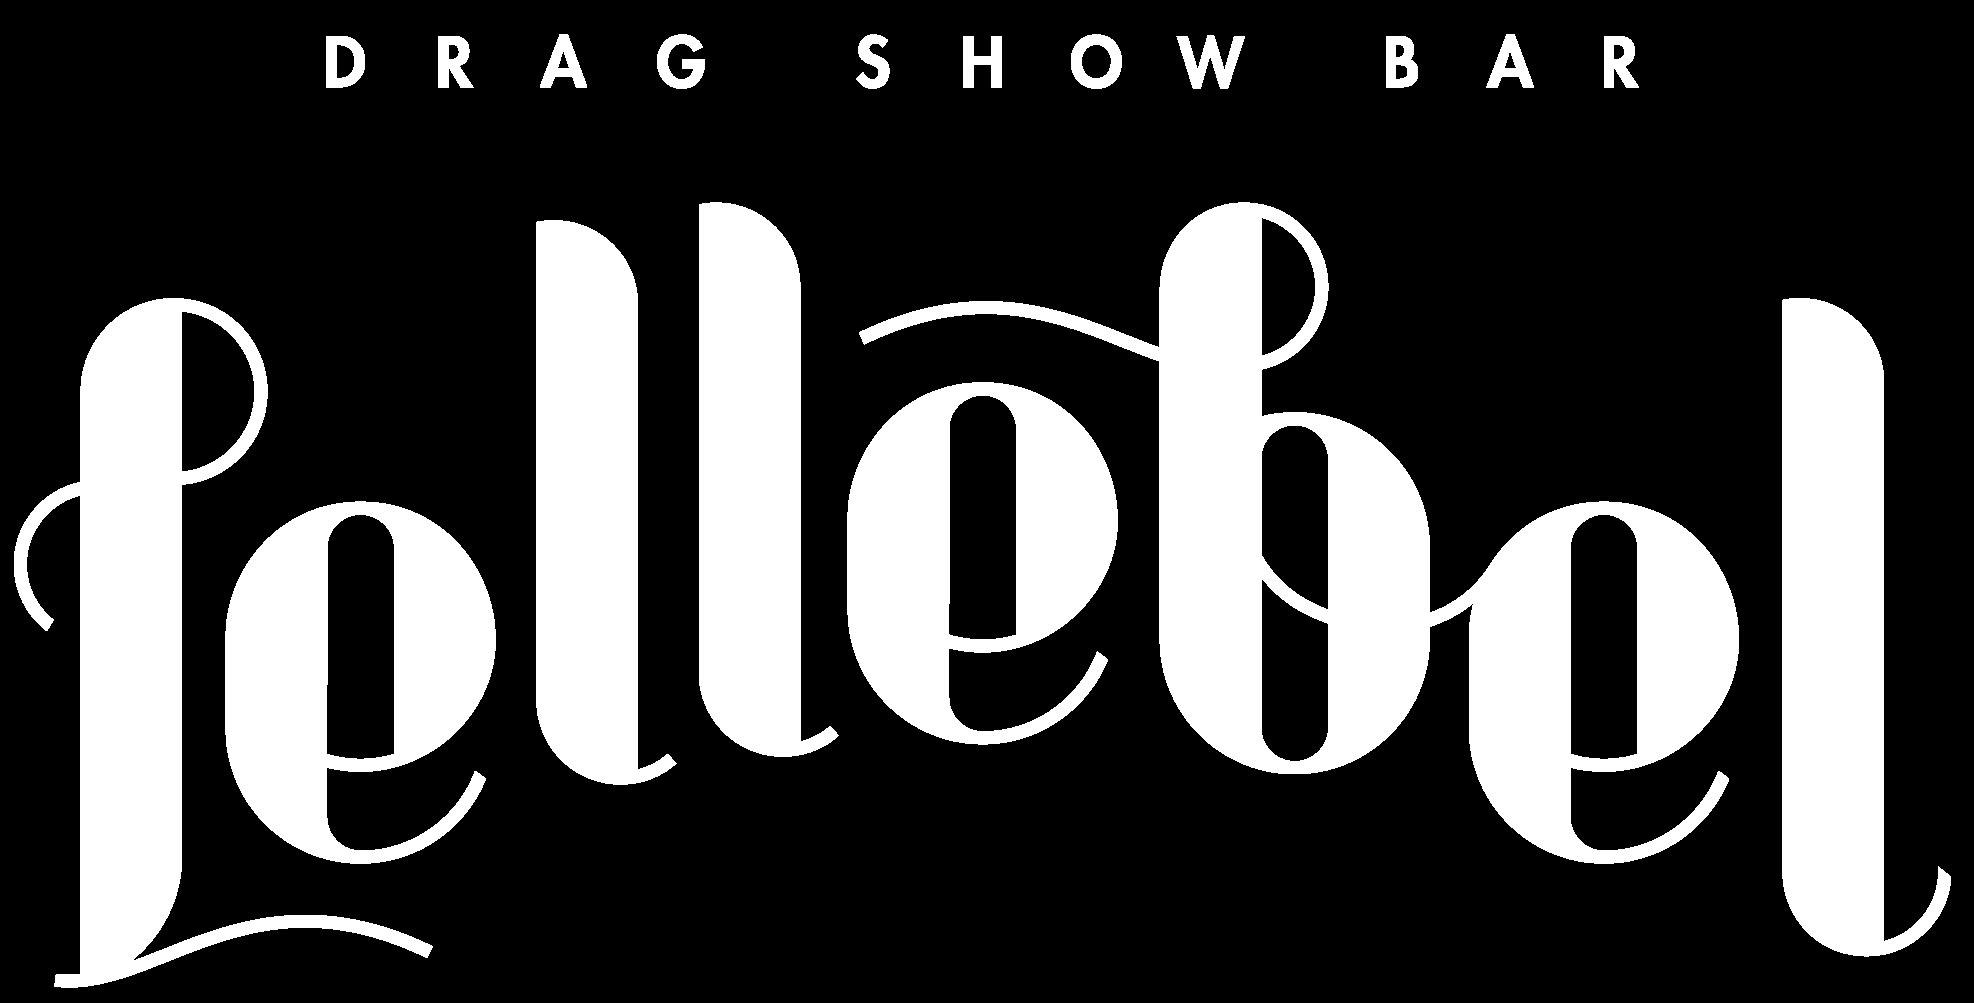 Drag Show Bar Lellebel